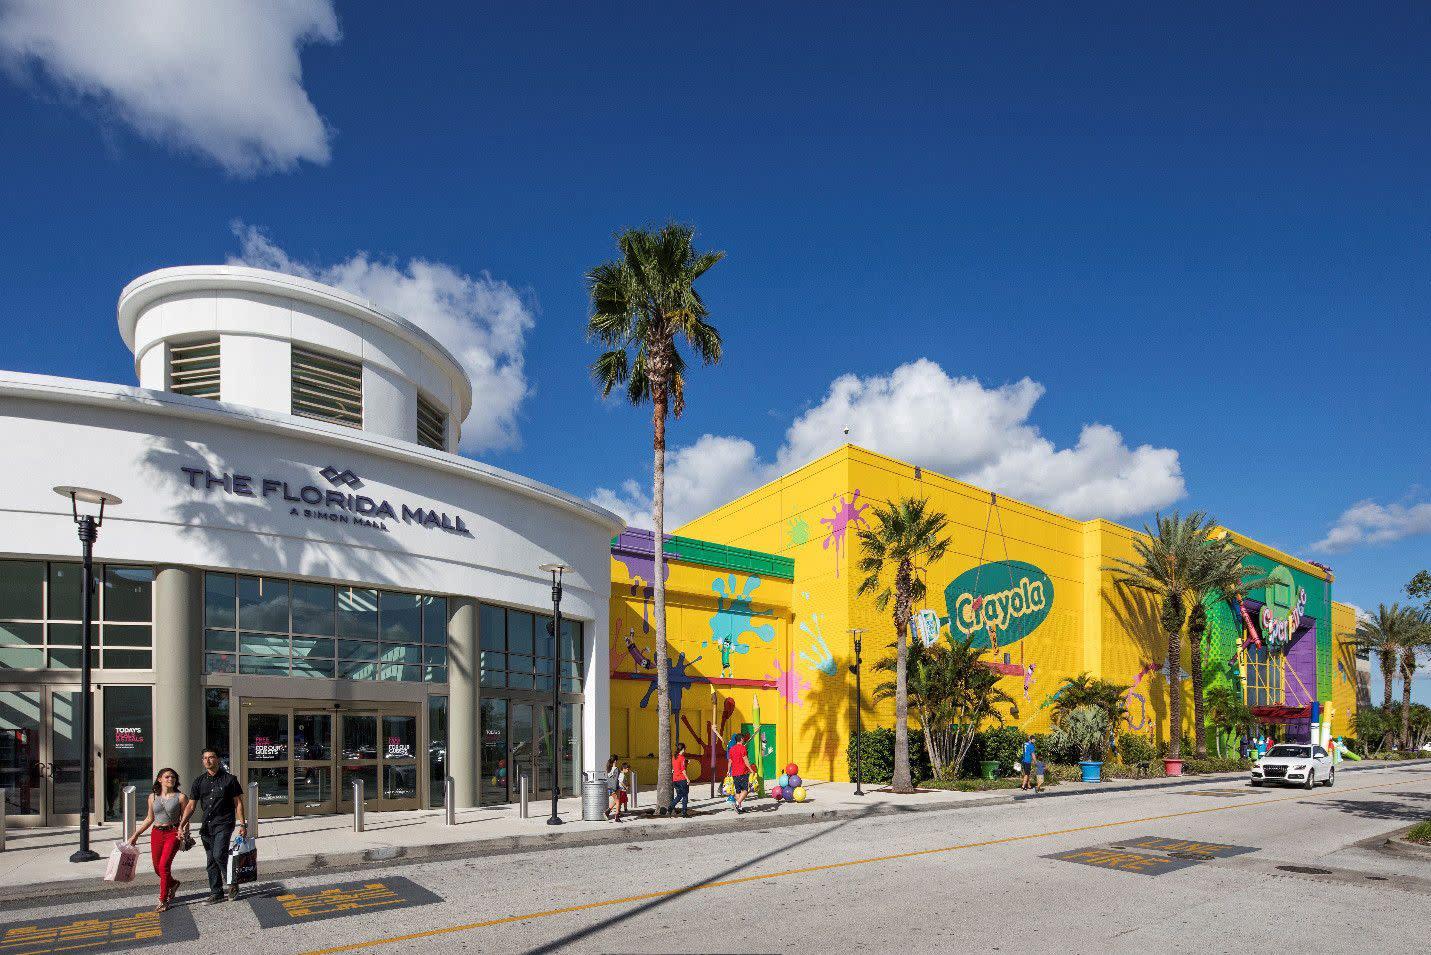 The Florida Mall in Orlando